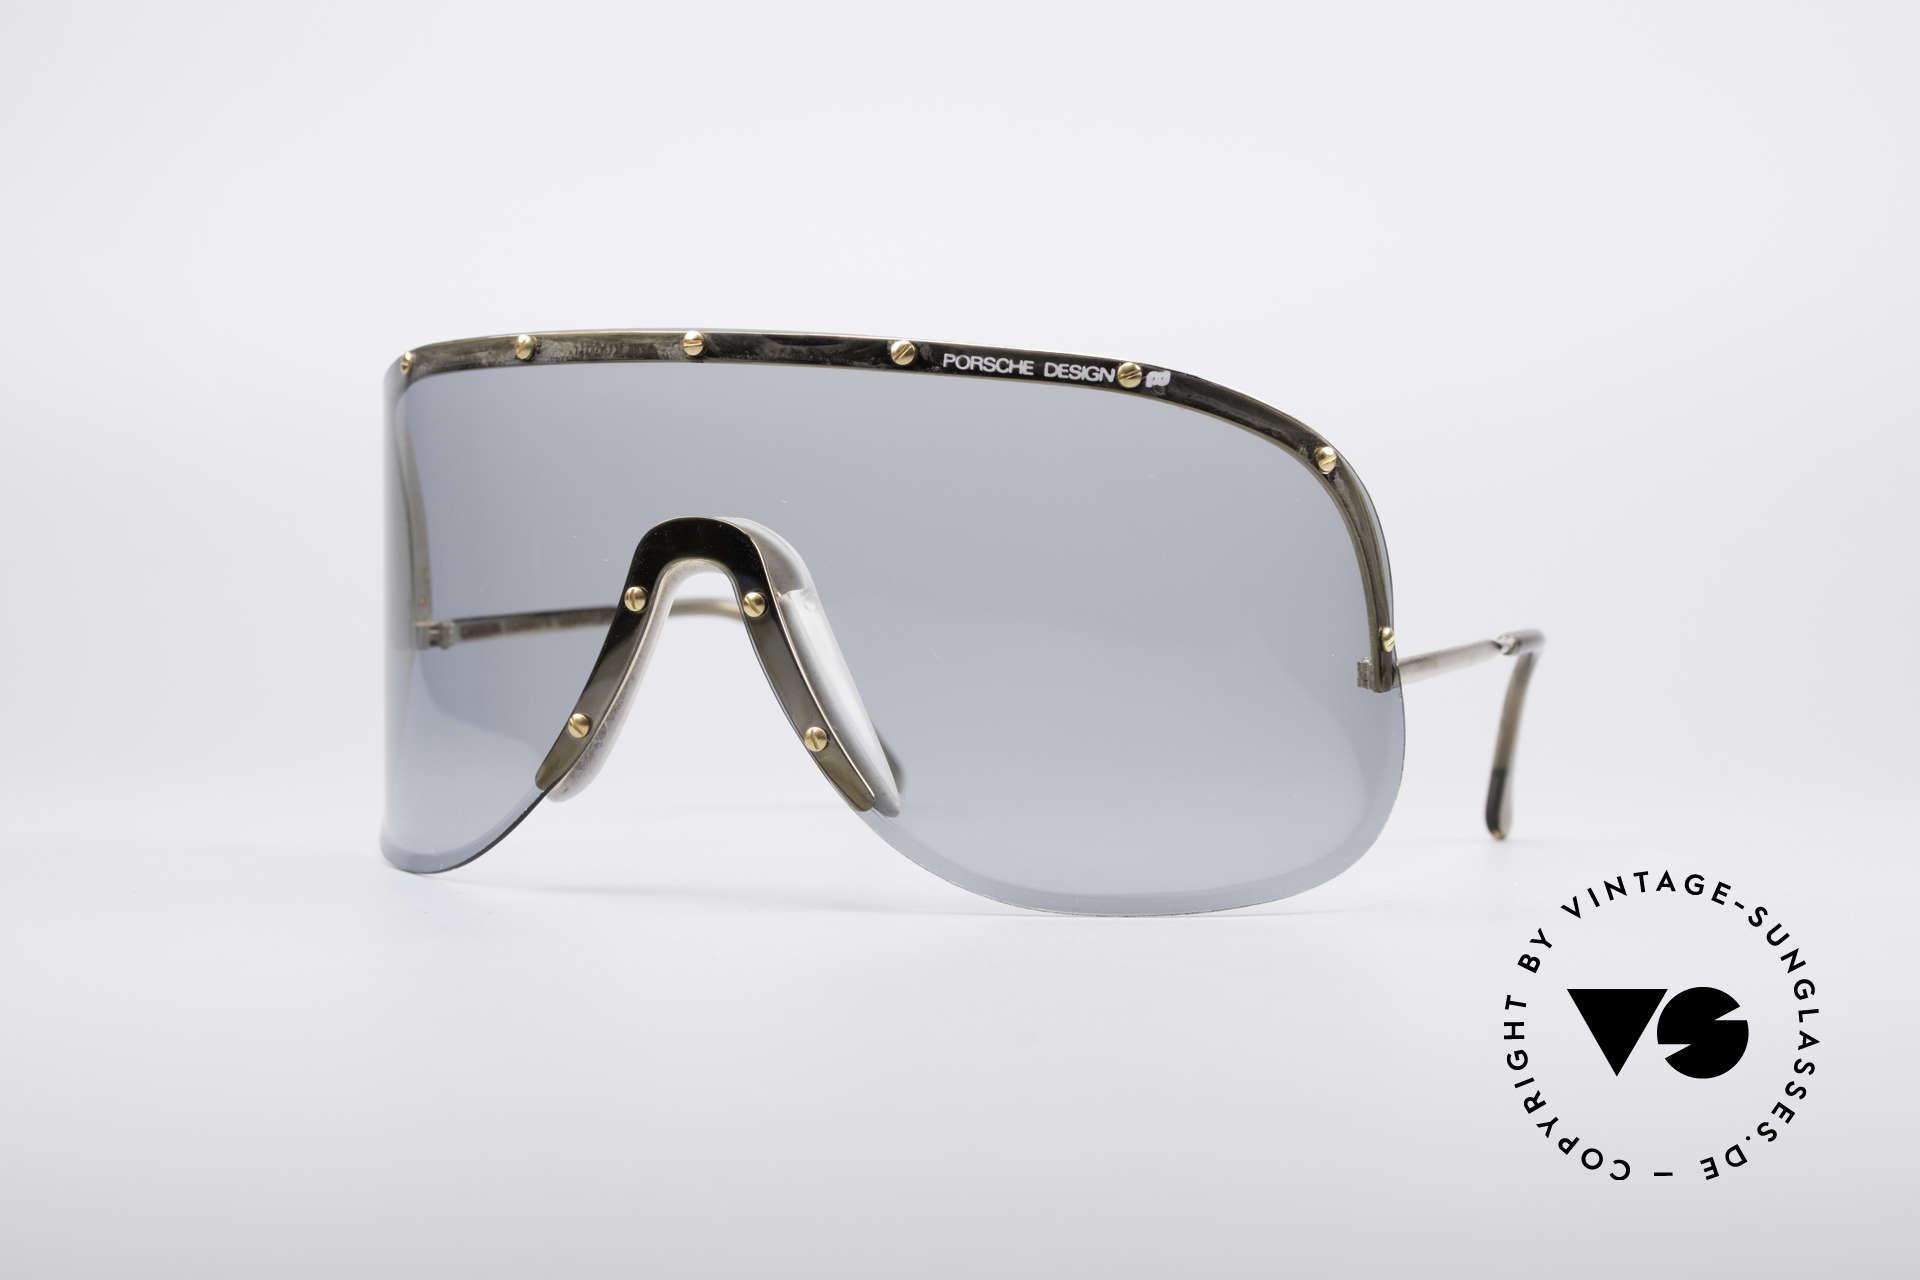 Porsche 5620 Original Yoko Ono Shades Gold, mod. 5620: vintage Porsche sunglasses by Carrera Design, Made for Men and Women